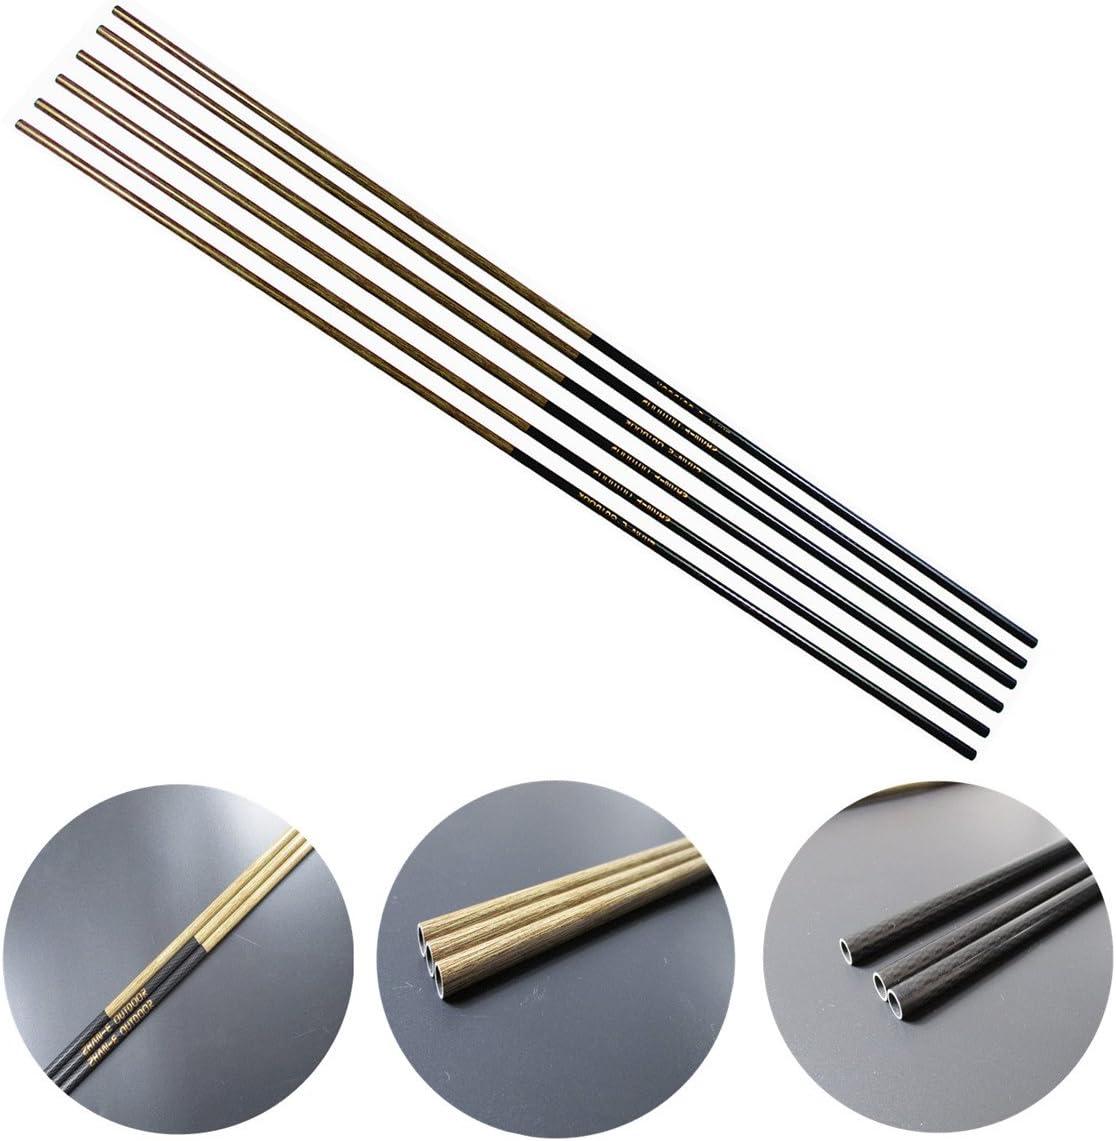 "DIY 32"" Carbon Arrow Shaft OD4.2mm Spine 600  Archery Tool Sports Hunting"